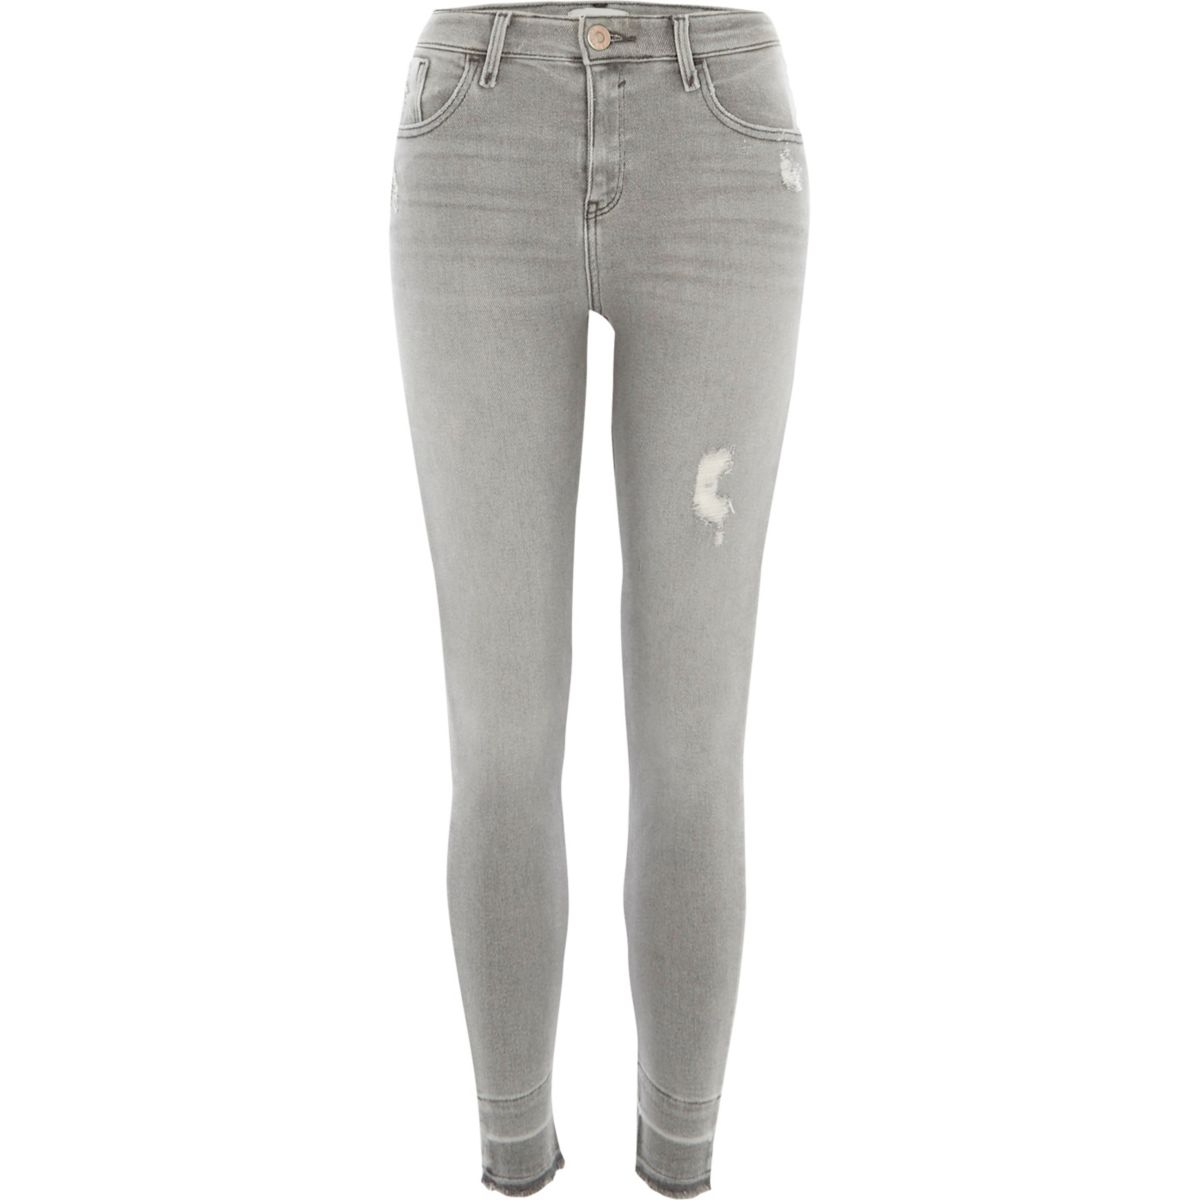 Grey Amelie distressed super skinny jeans